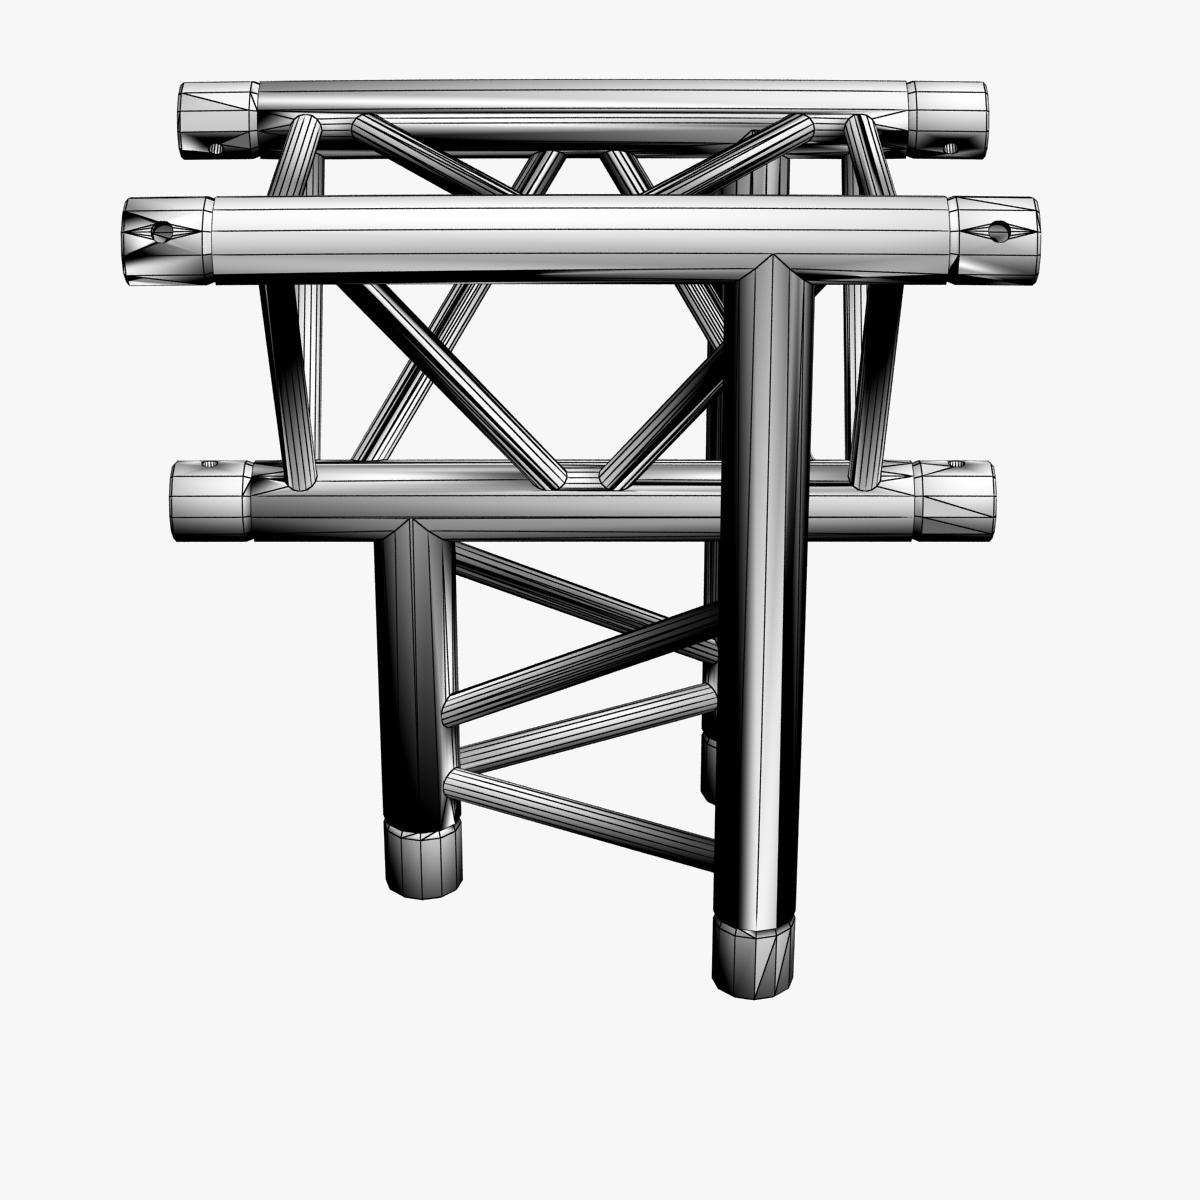 triangular trusses (collection 55 modular pieces) 3d model 3ds max dxf fbx c4d dae texture obj 216222